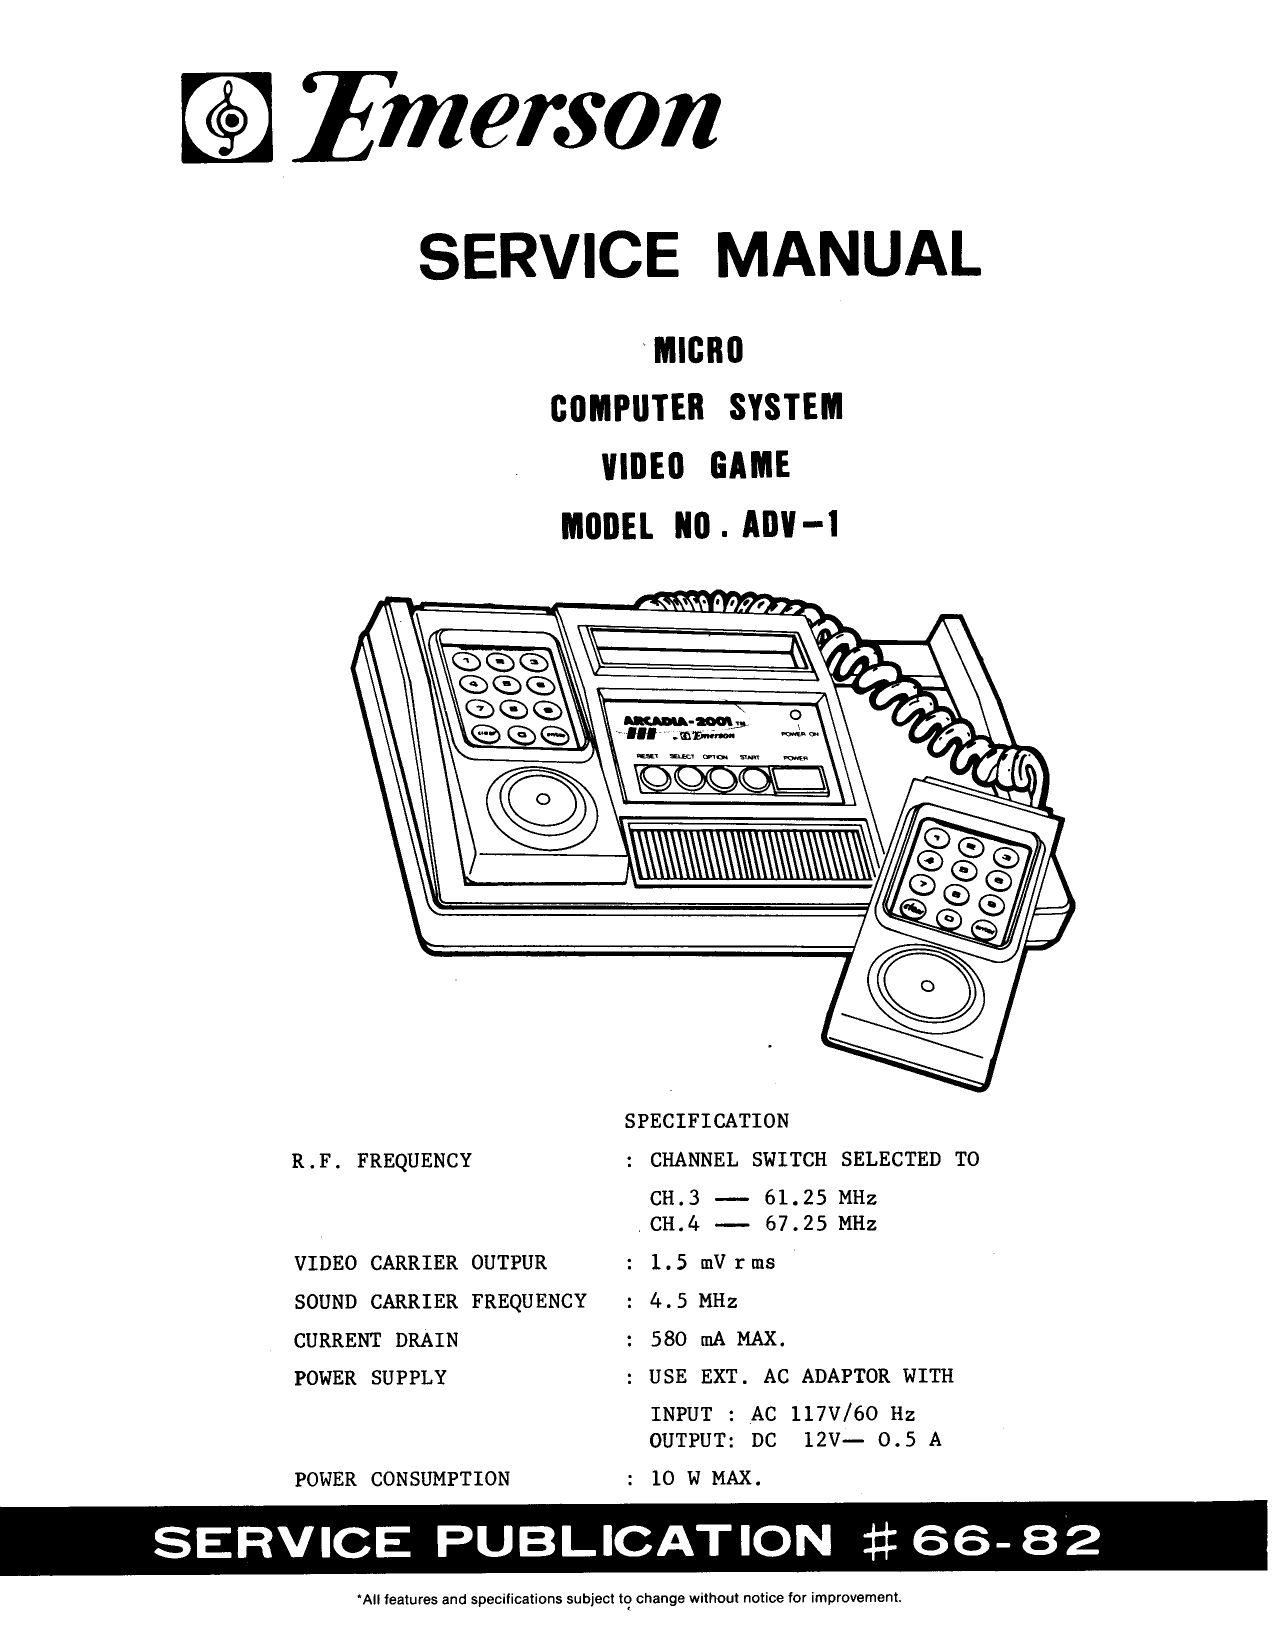 Emersion Arcadia 2001 service manual by Olivier Boisseau